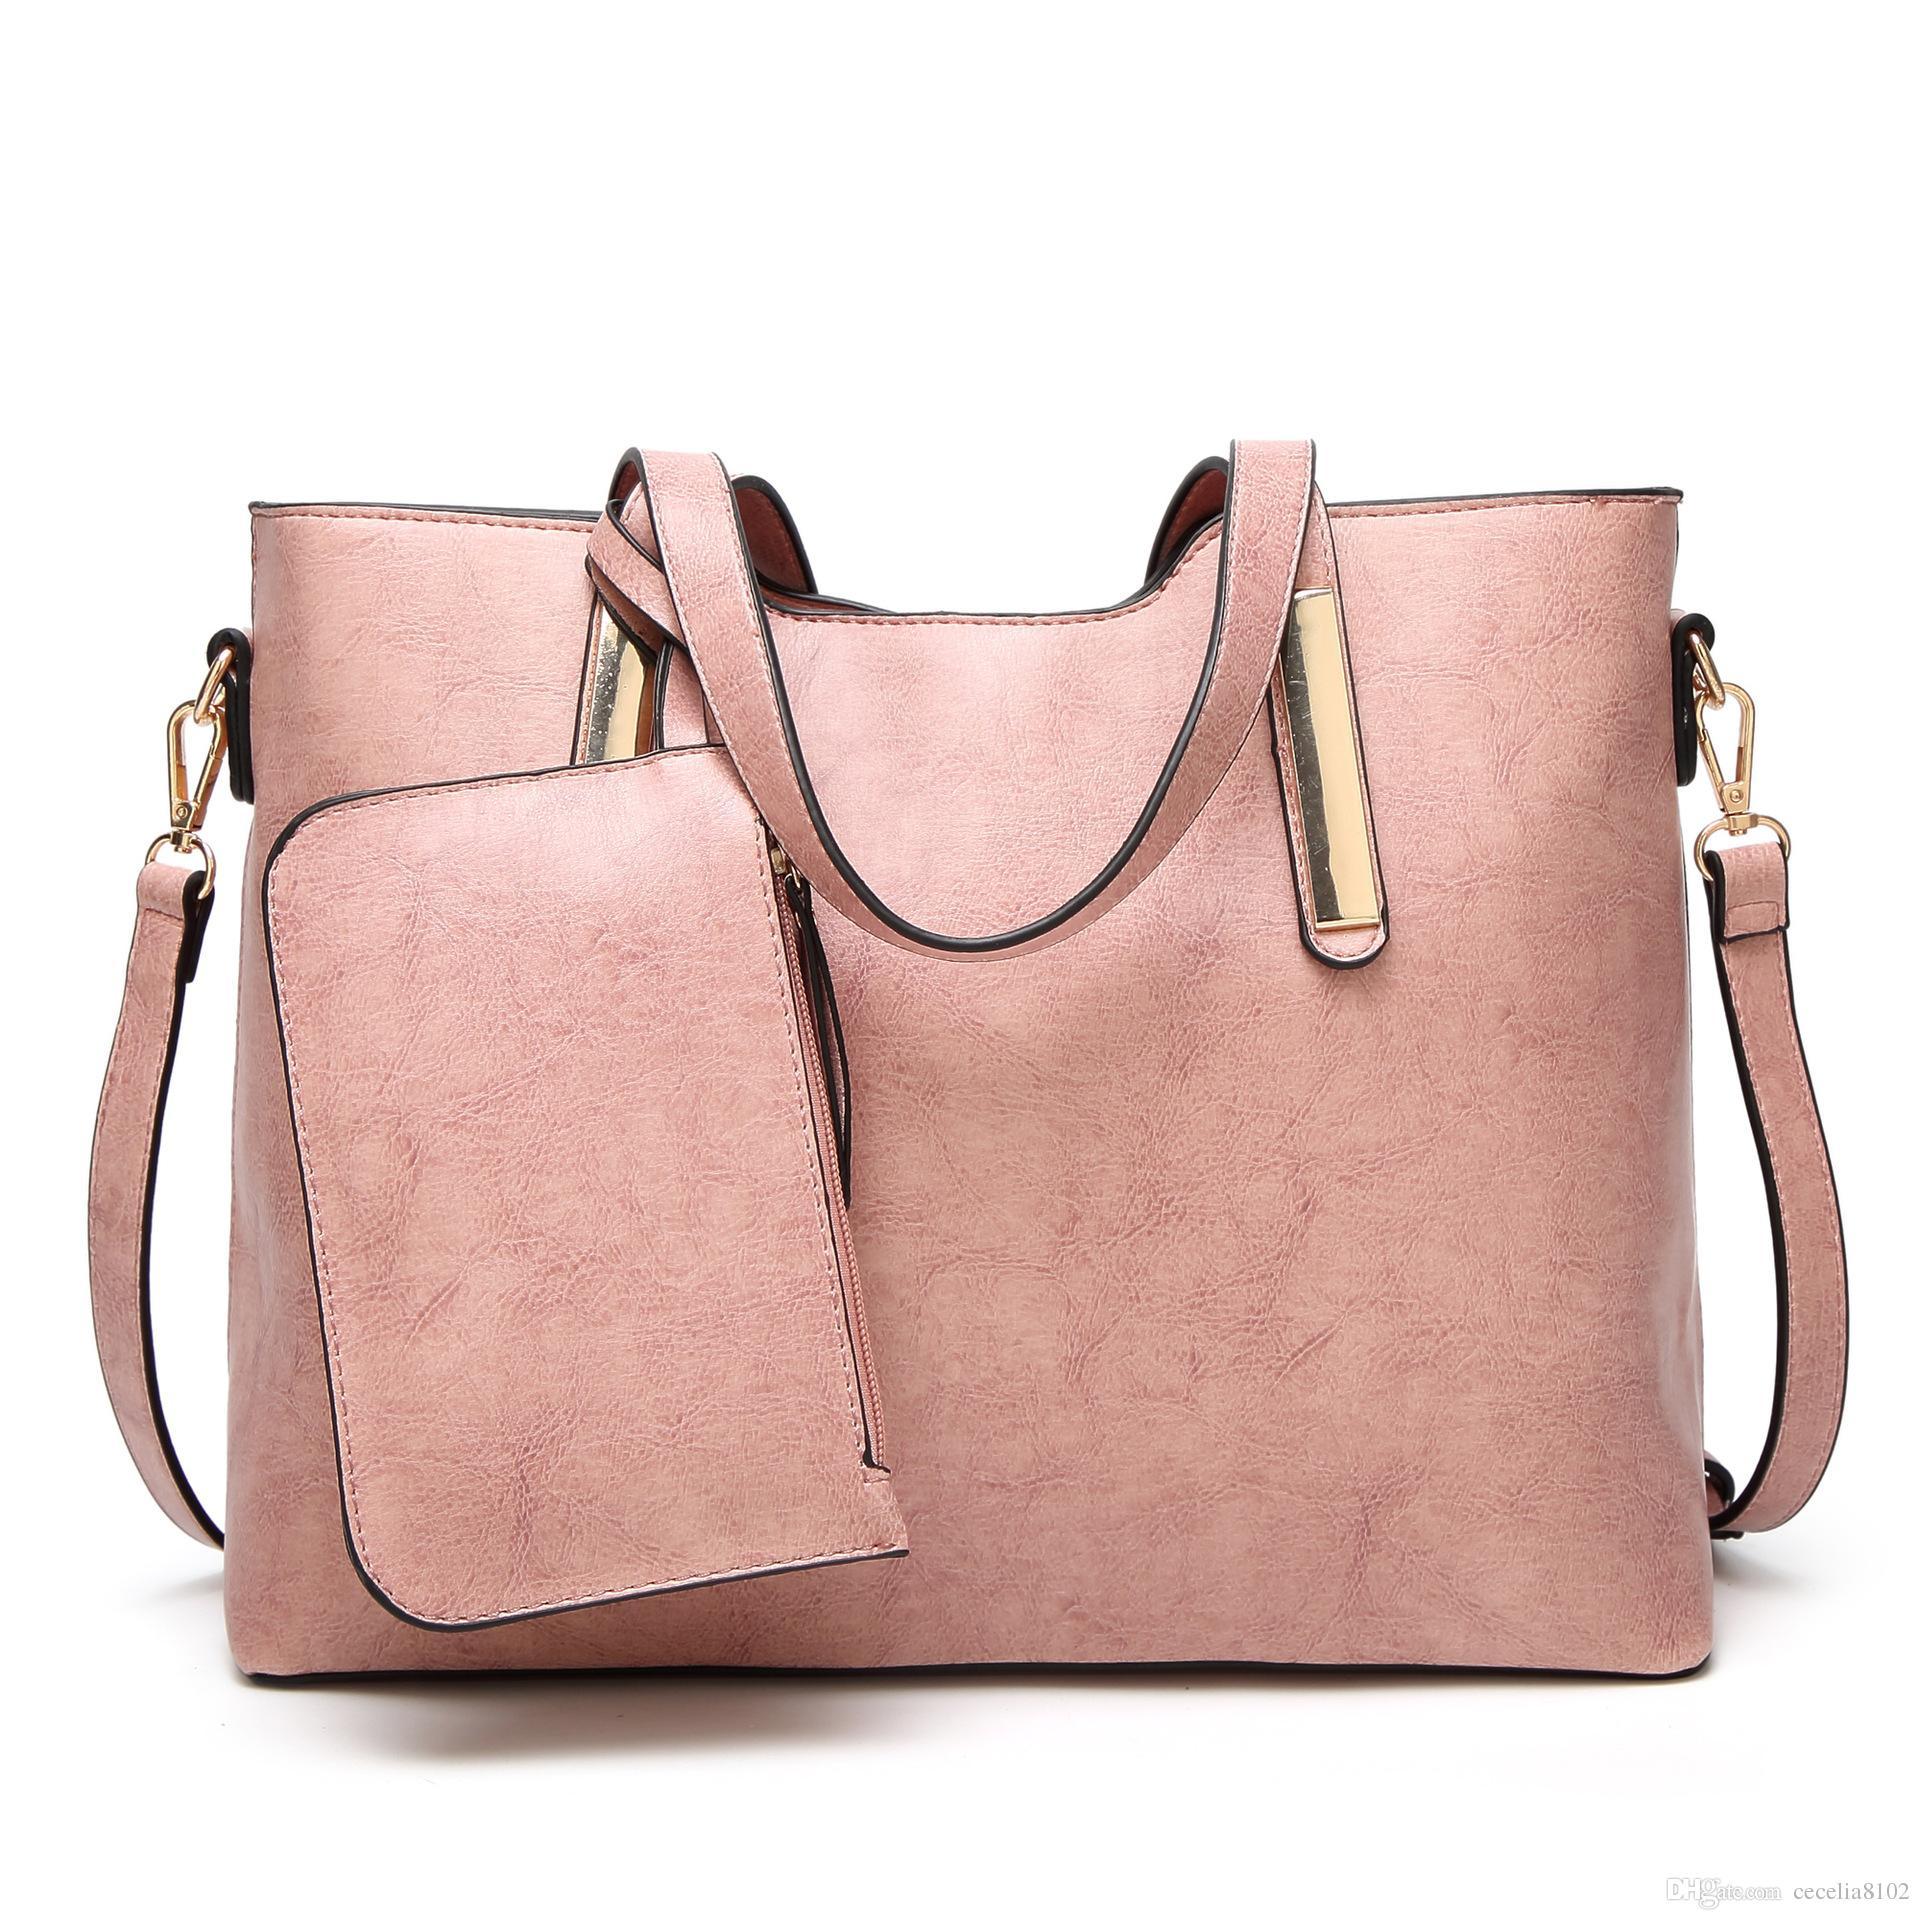 New Fashionable Women Designer Crossbody Bag Classic Style Shoulder Fashion Bags  Women Lady Totes Handbags Purses Travel-bags 35 Women Crossbody Bag Women  ... 44b2a26784b27